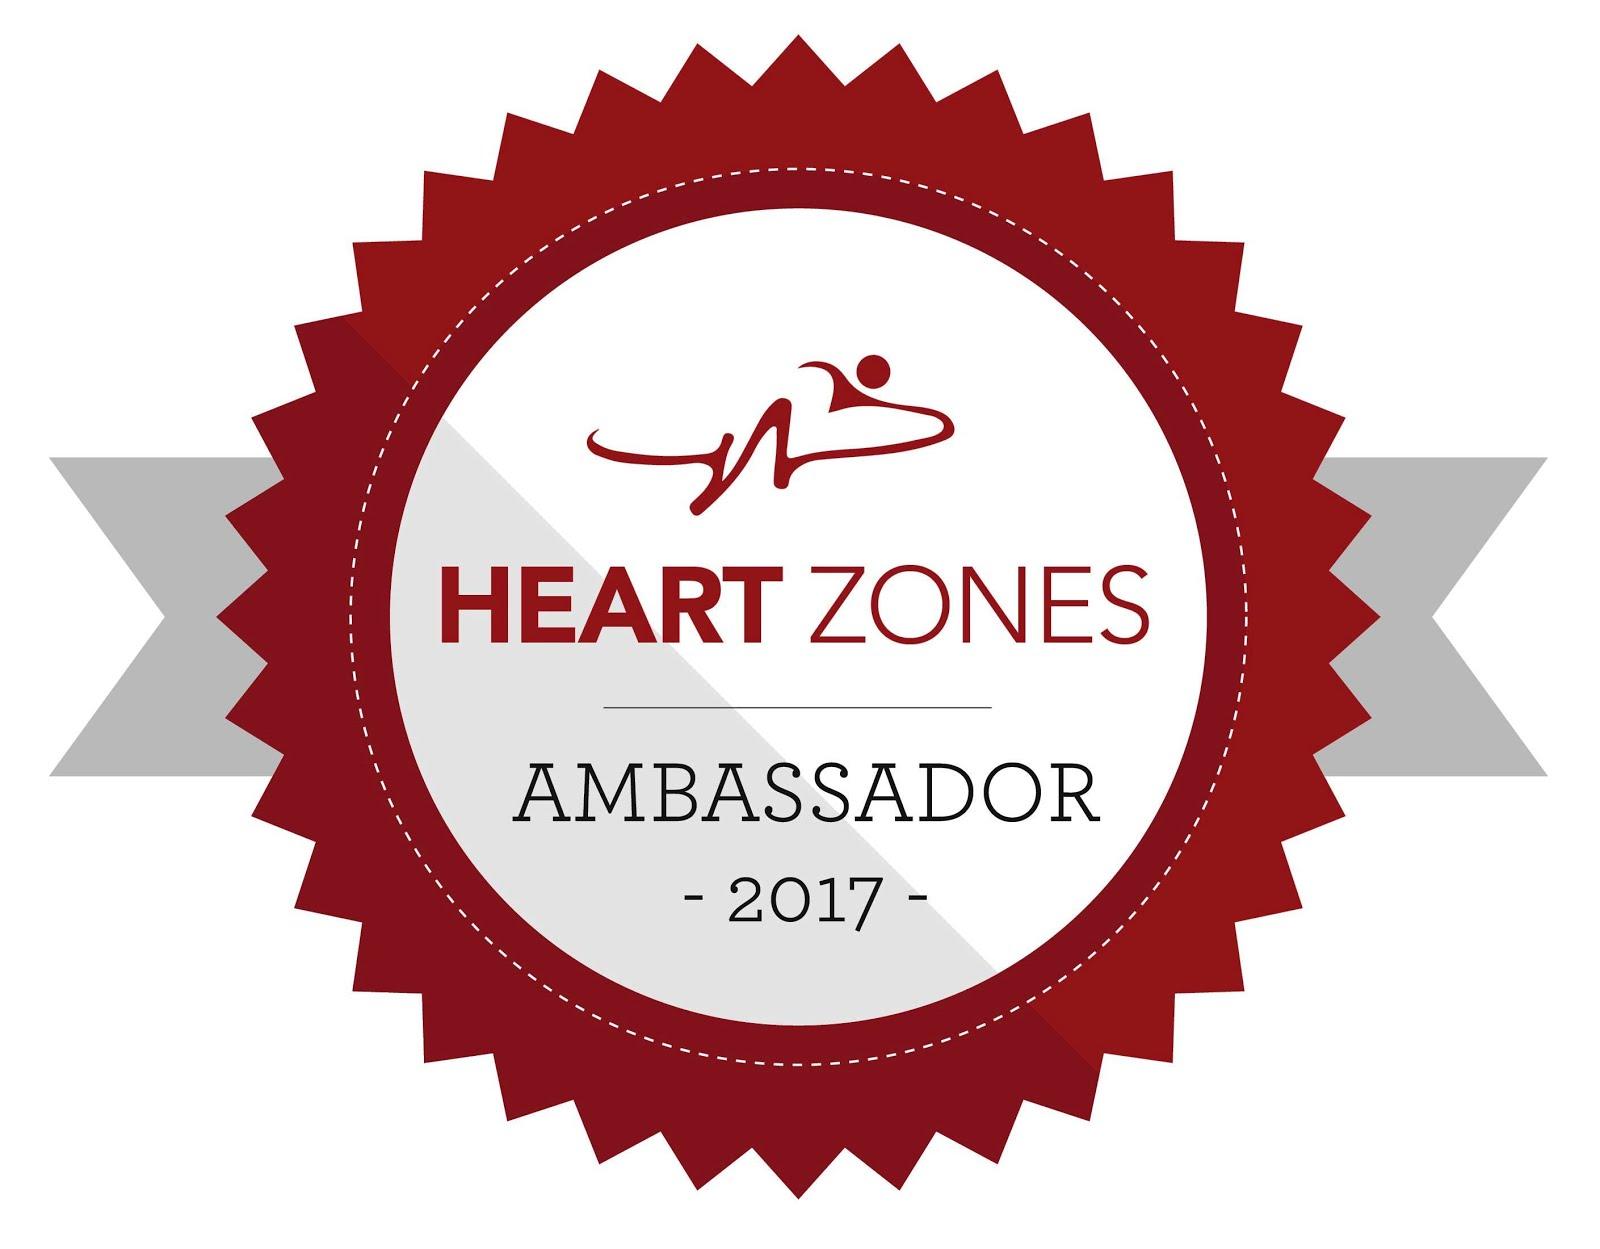 Heartzones Ambassador 2017